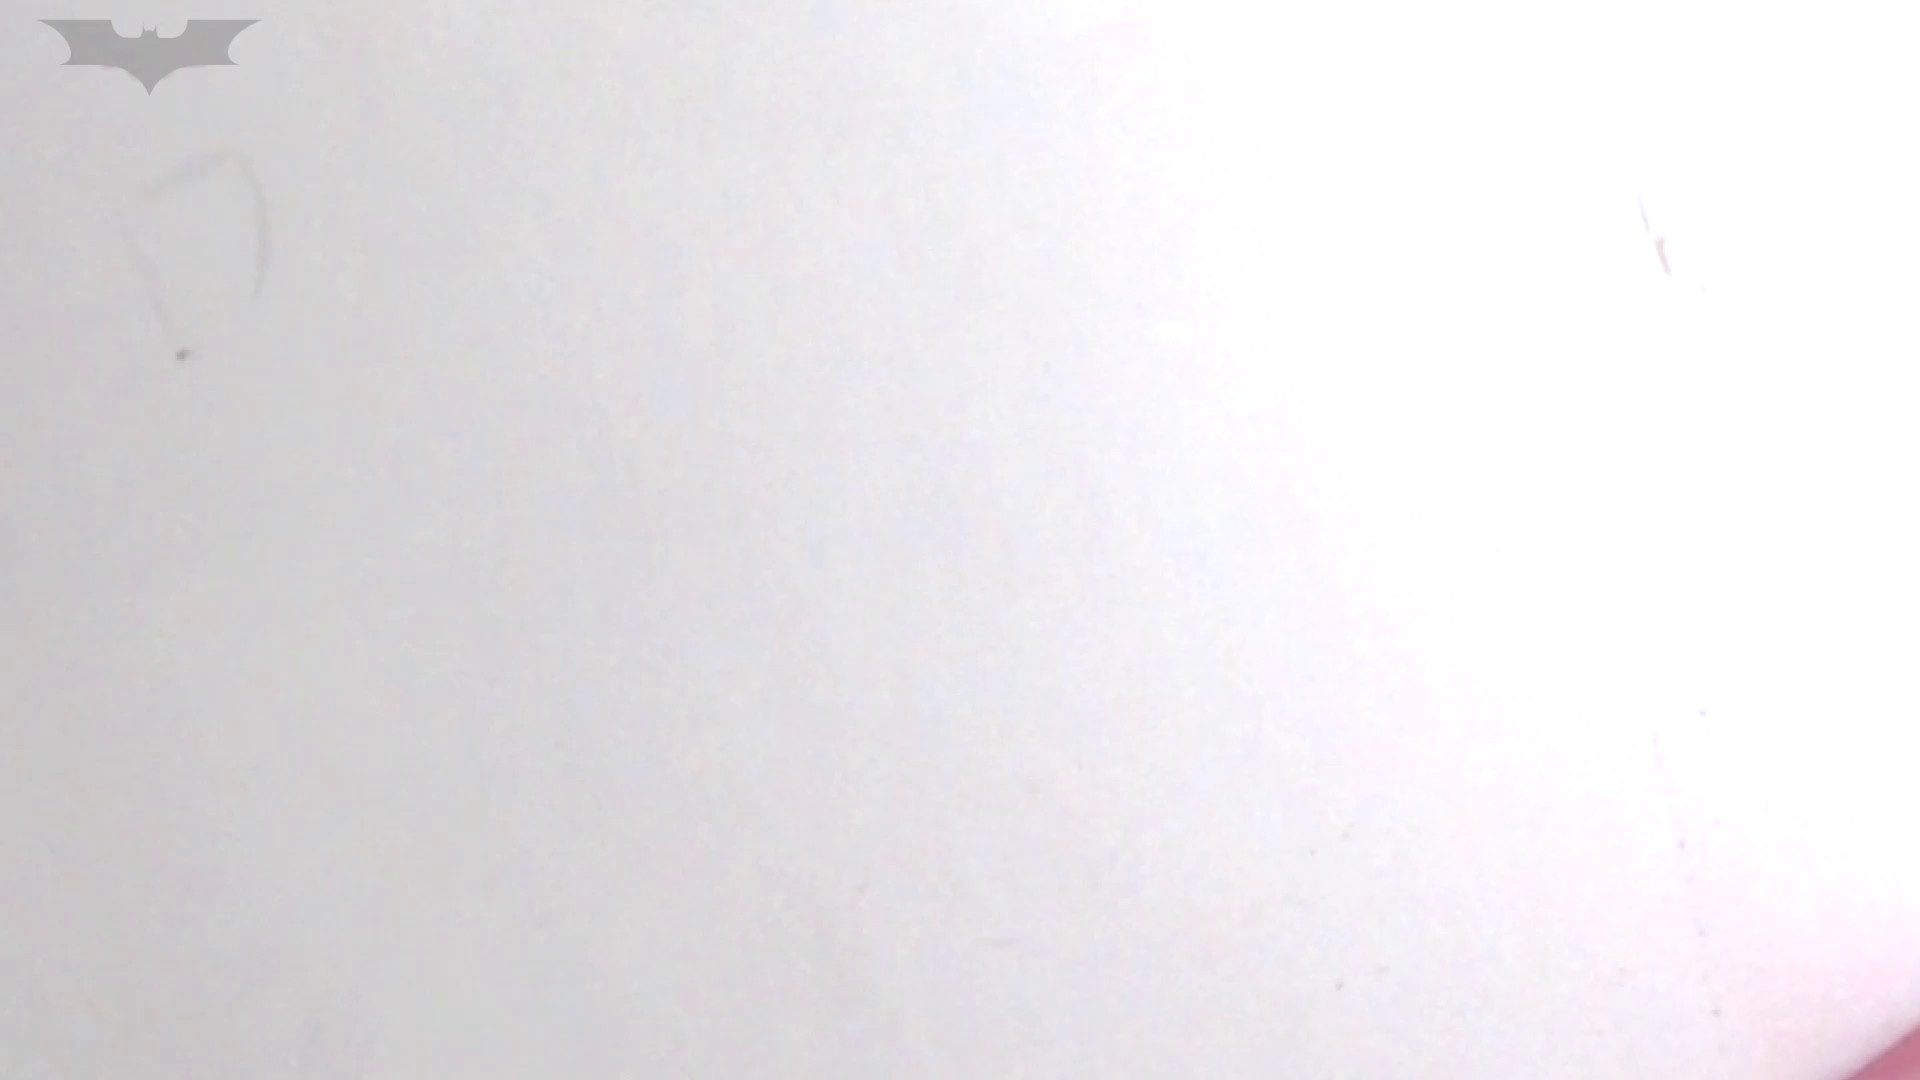 JD盗撮 美女の洗面所の秘密 Vol.10 盗撮で悶絶 AV無料動画キャプチャ 78画像 38